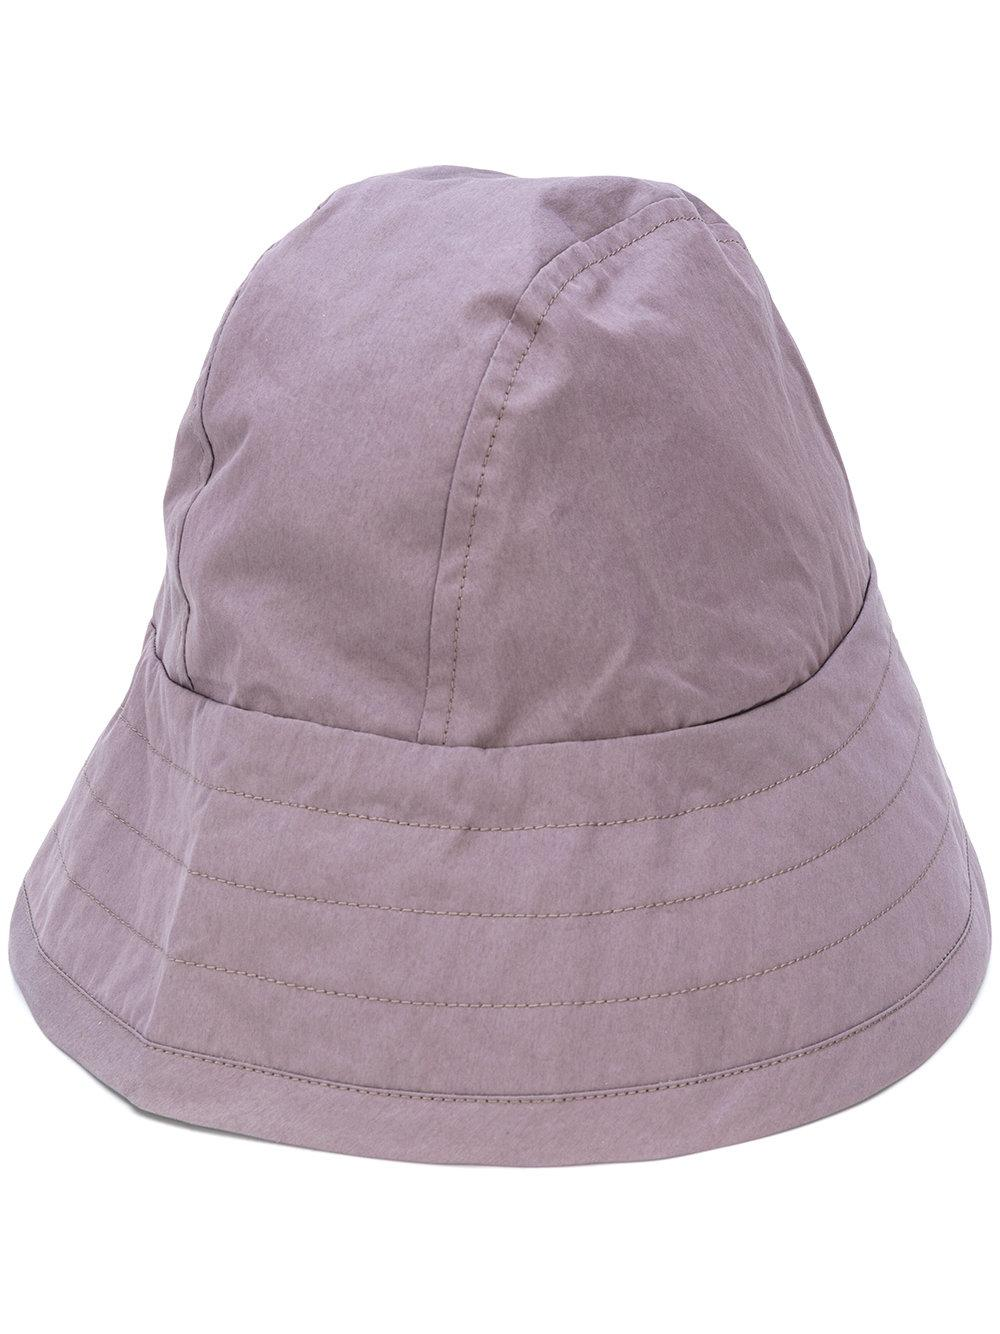 Lyst - Craig Green Bonnet Style Hat in Purple for Men b9d723acd3ac